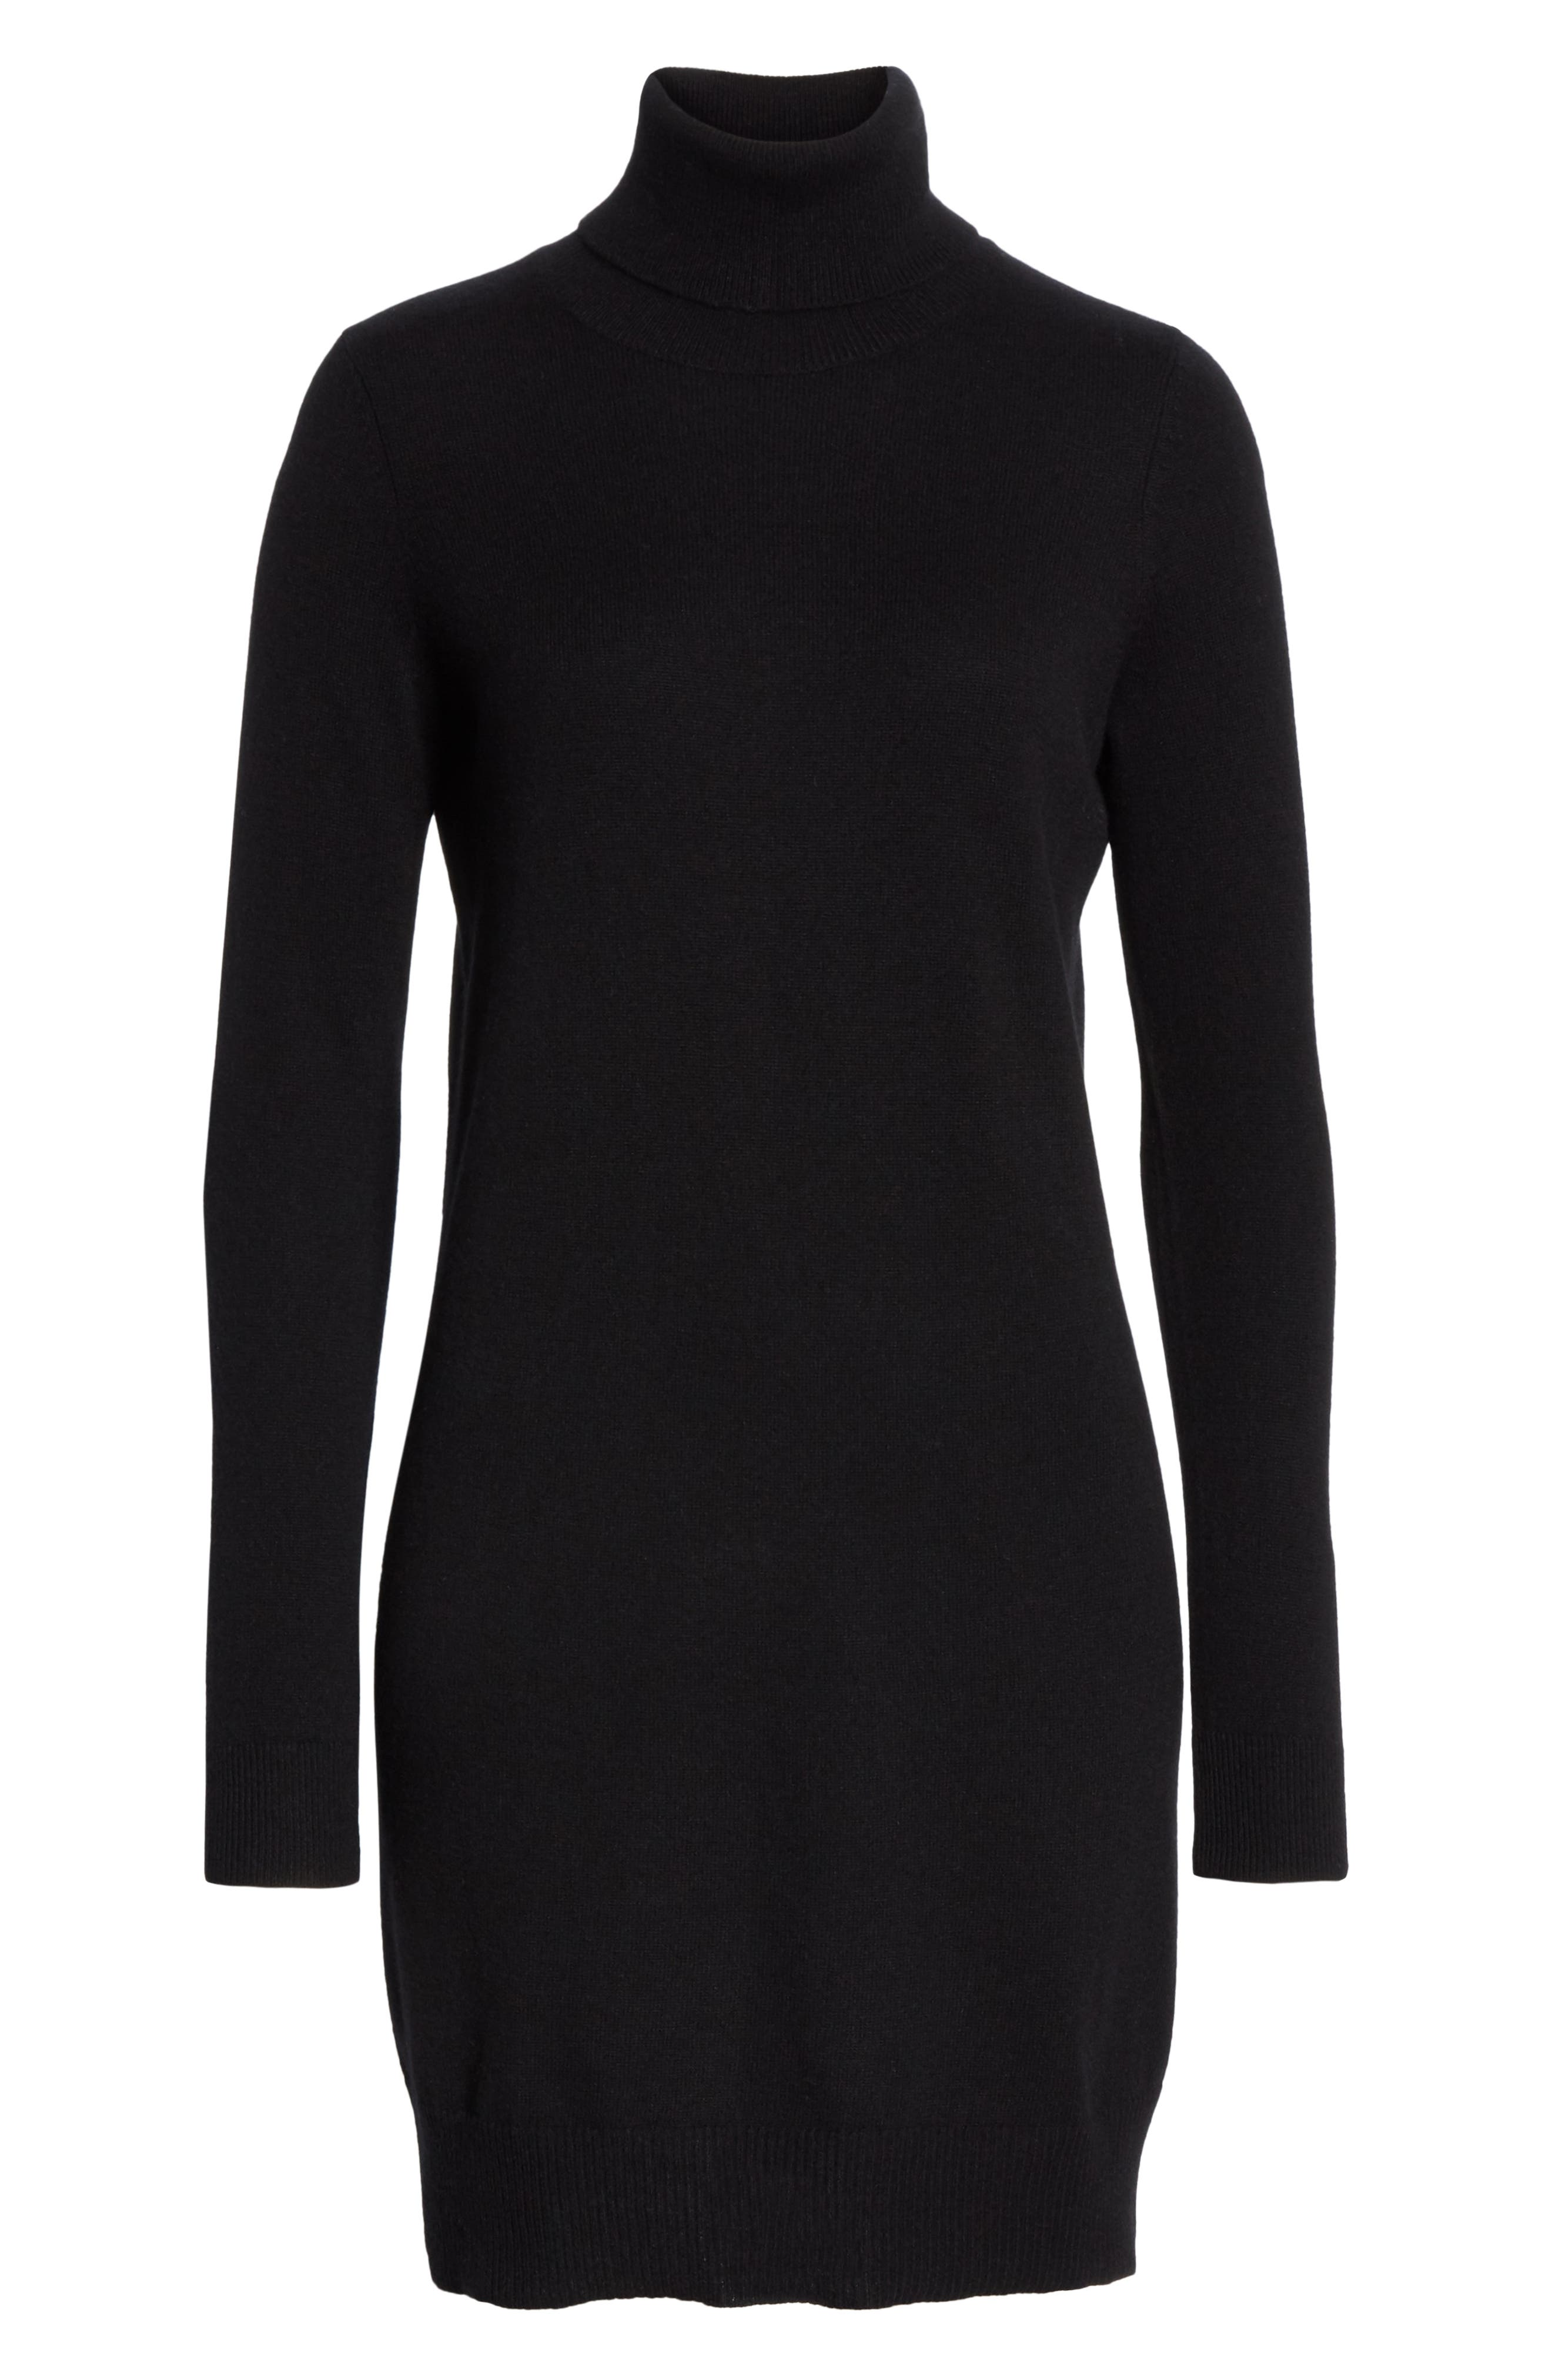 Cashmere Turtleneck Sweater Dress,                             Alternate thumbnail 6, color,                             001